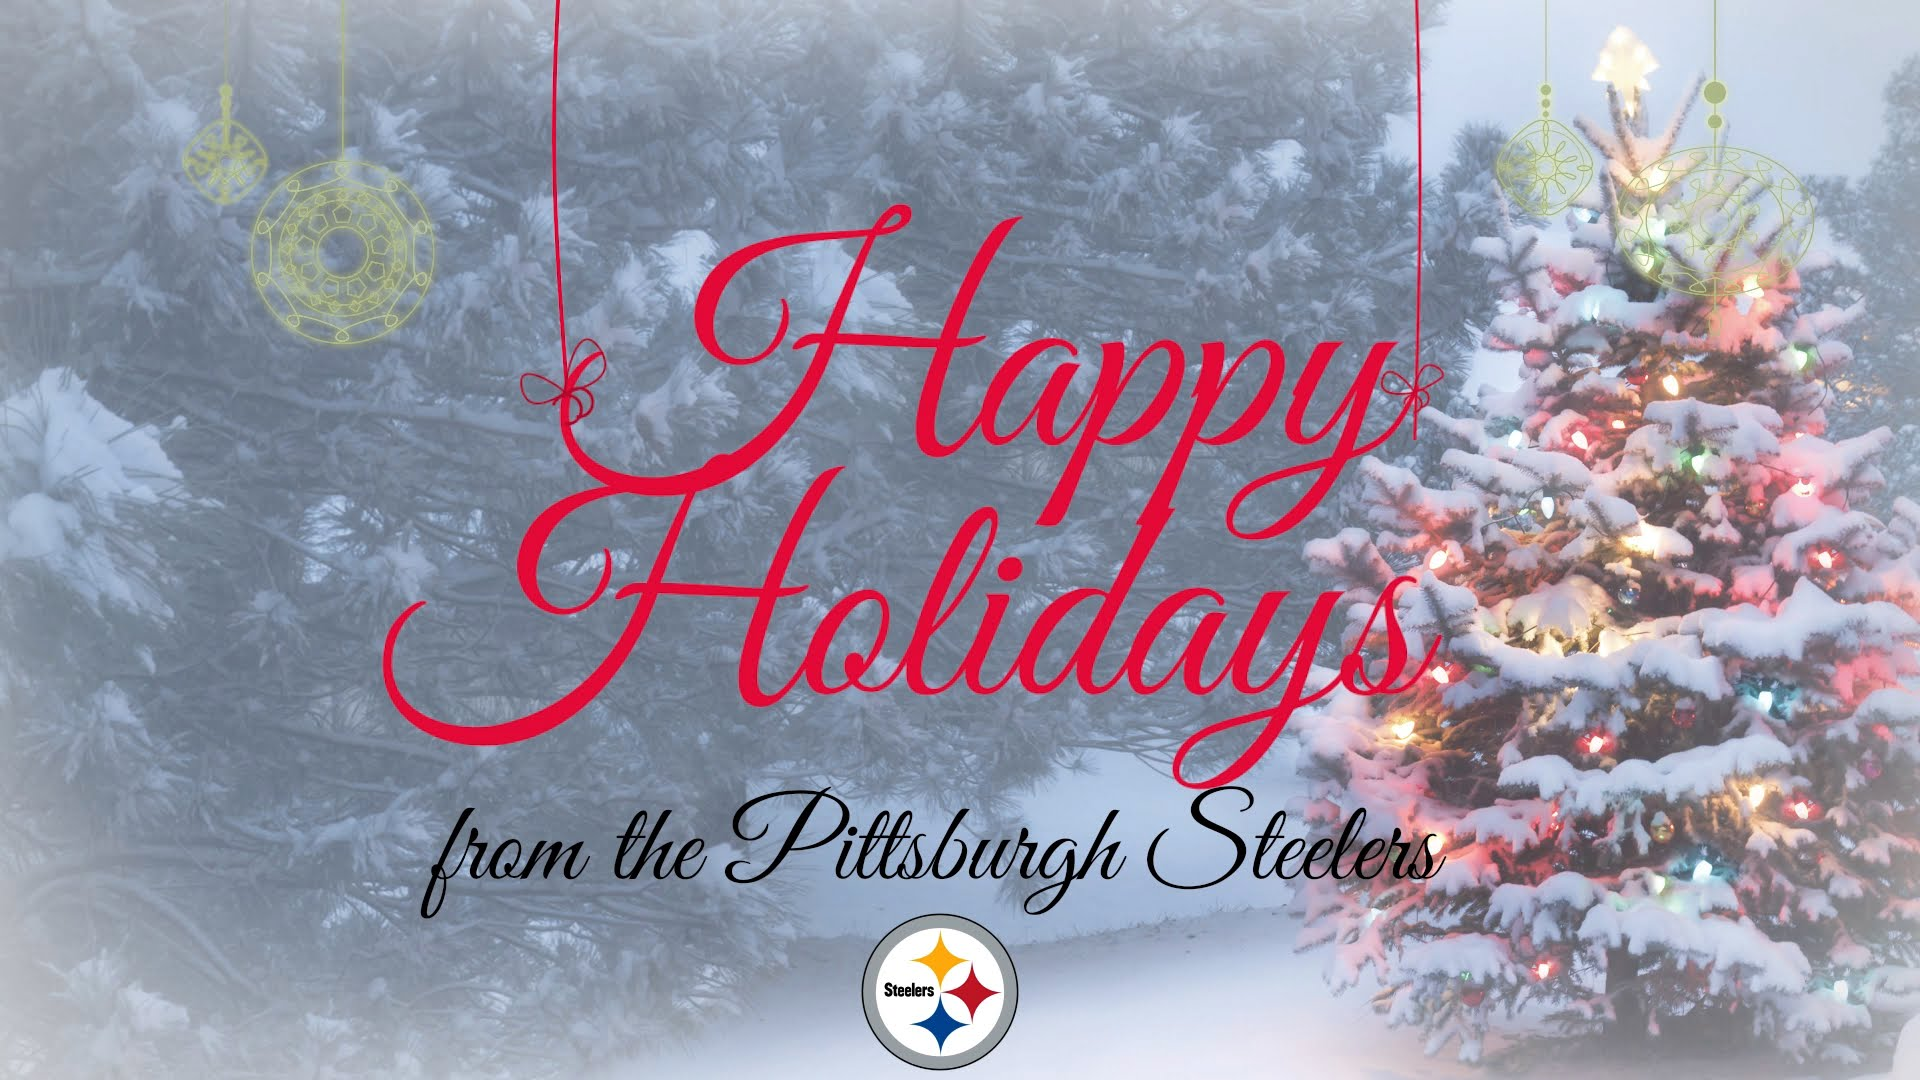 Pittsburgh Steelers sing a Christmas Carol